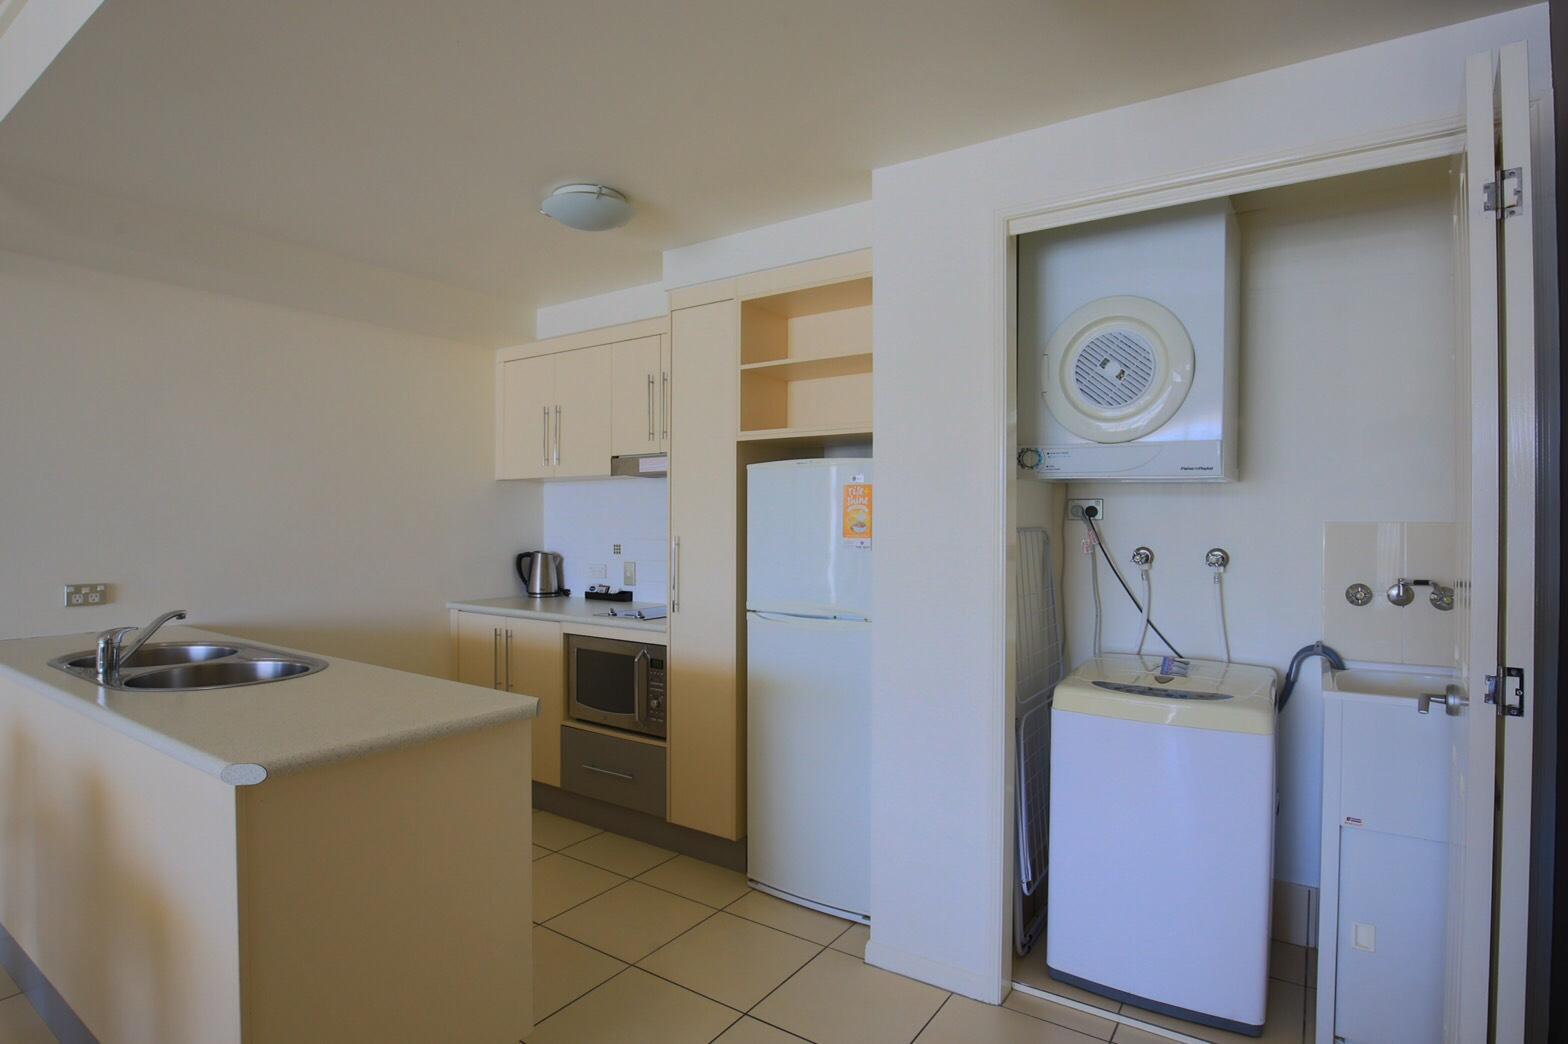 <p>冷蔵庫や洗濯機もお部屋内に完備、長期滞在の方にはとっても嬉しい。</p>